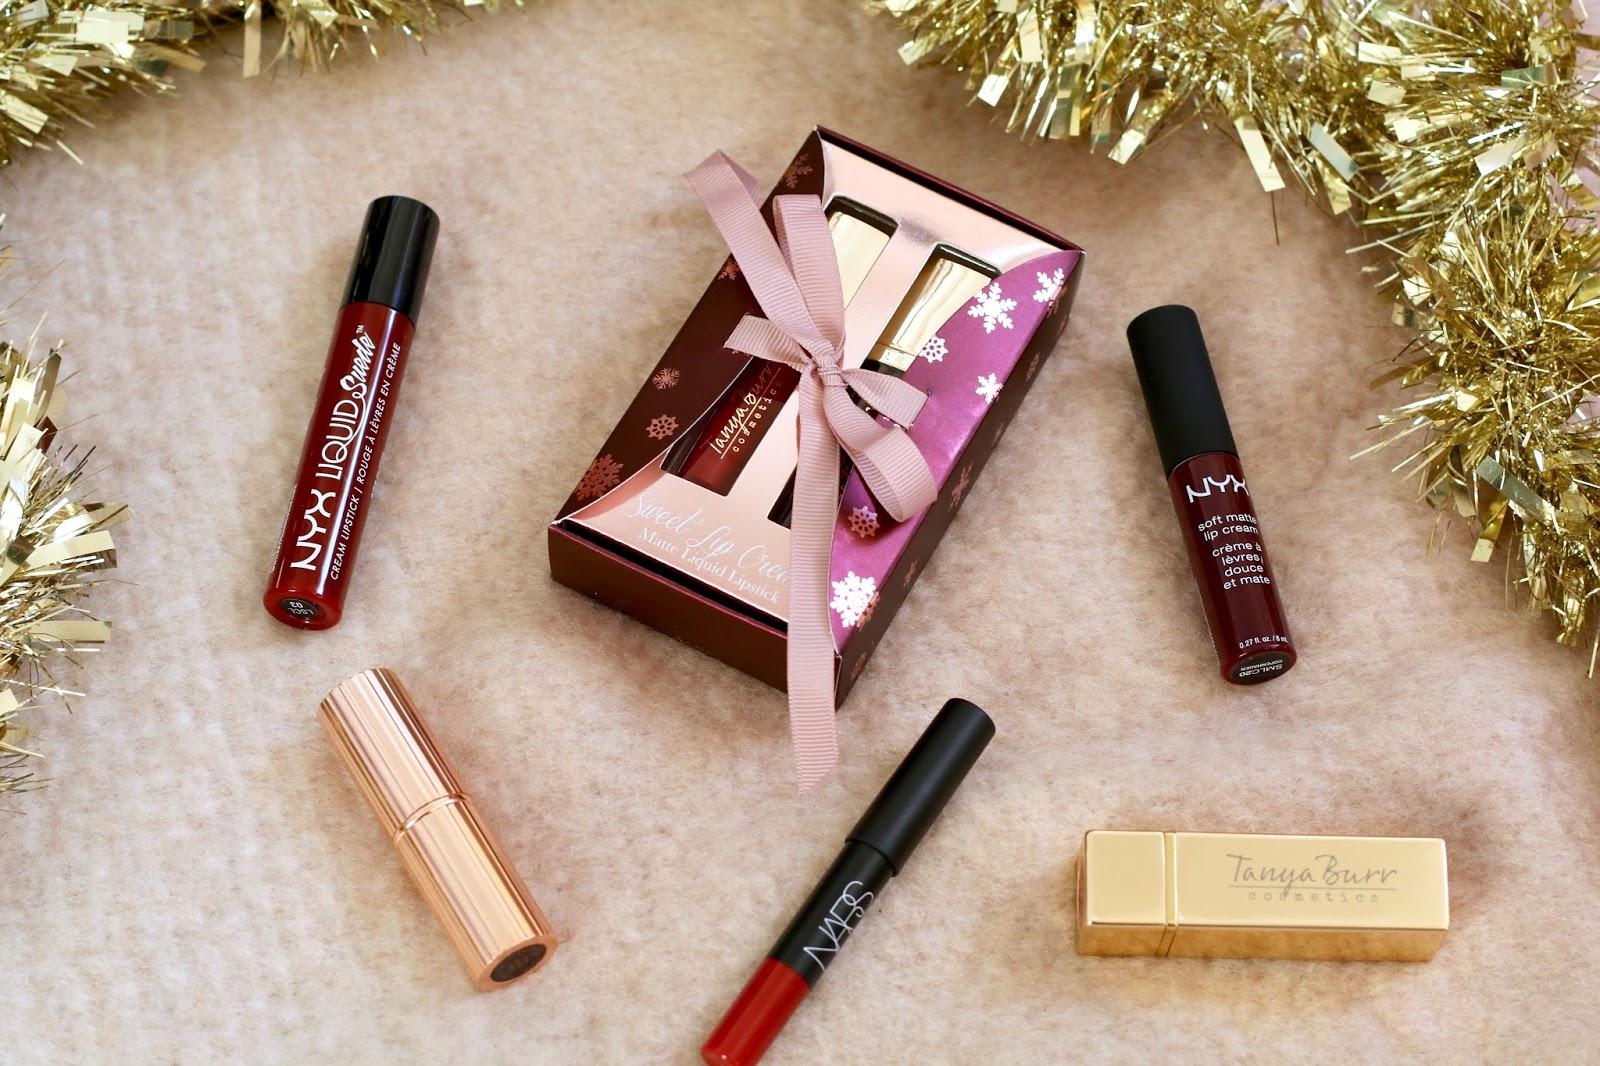 The-Perfect-Red-Lip-For-Christmas-Charlotte-Tilbury-Red-Carpet-Red-Nars-velvet-matte-lip-pencil-in-Cruella-Tanya-Burr-cosmetics-in-Big-Kiss-and-Santas-Little-Helper-NYX-soft-matte-lip-cream-in-Copenhagen-NYX-liquid-suede-in-Cherry-Skies